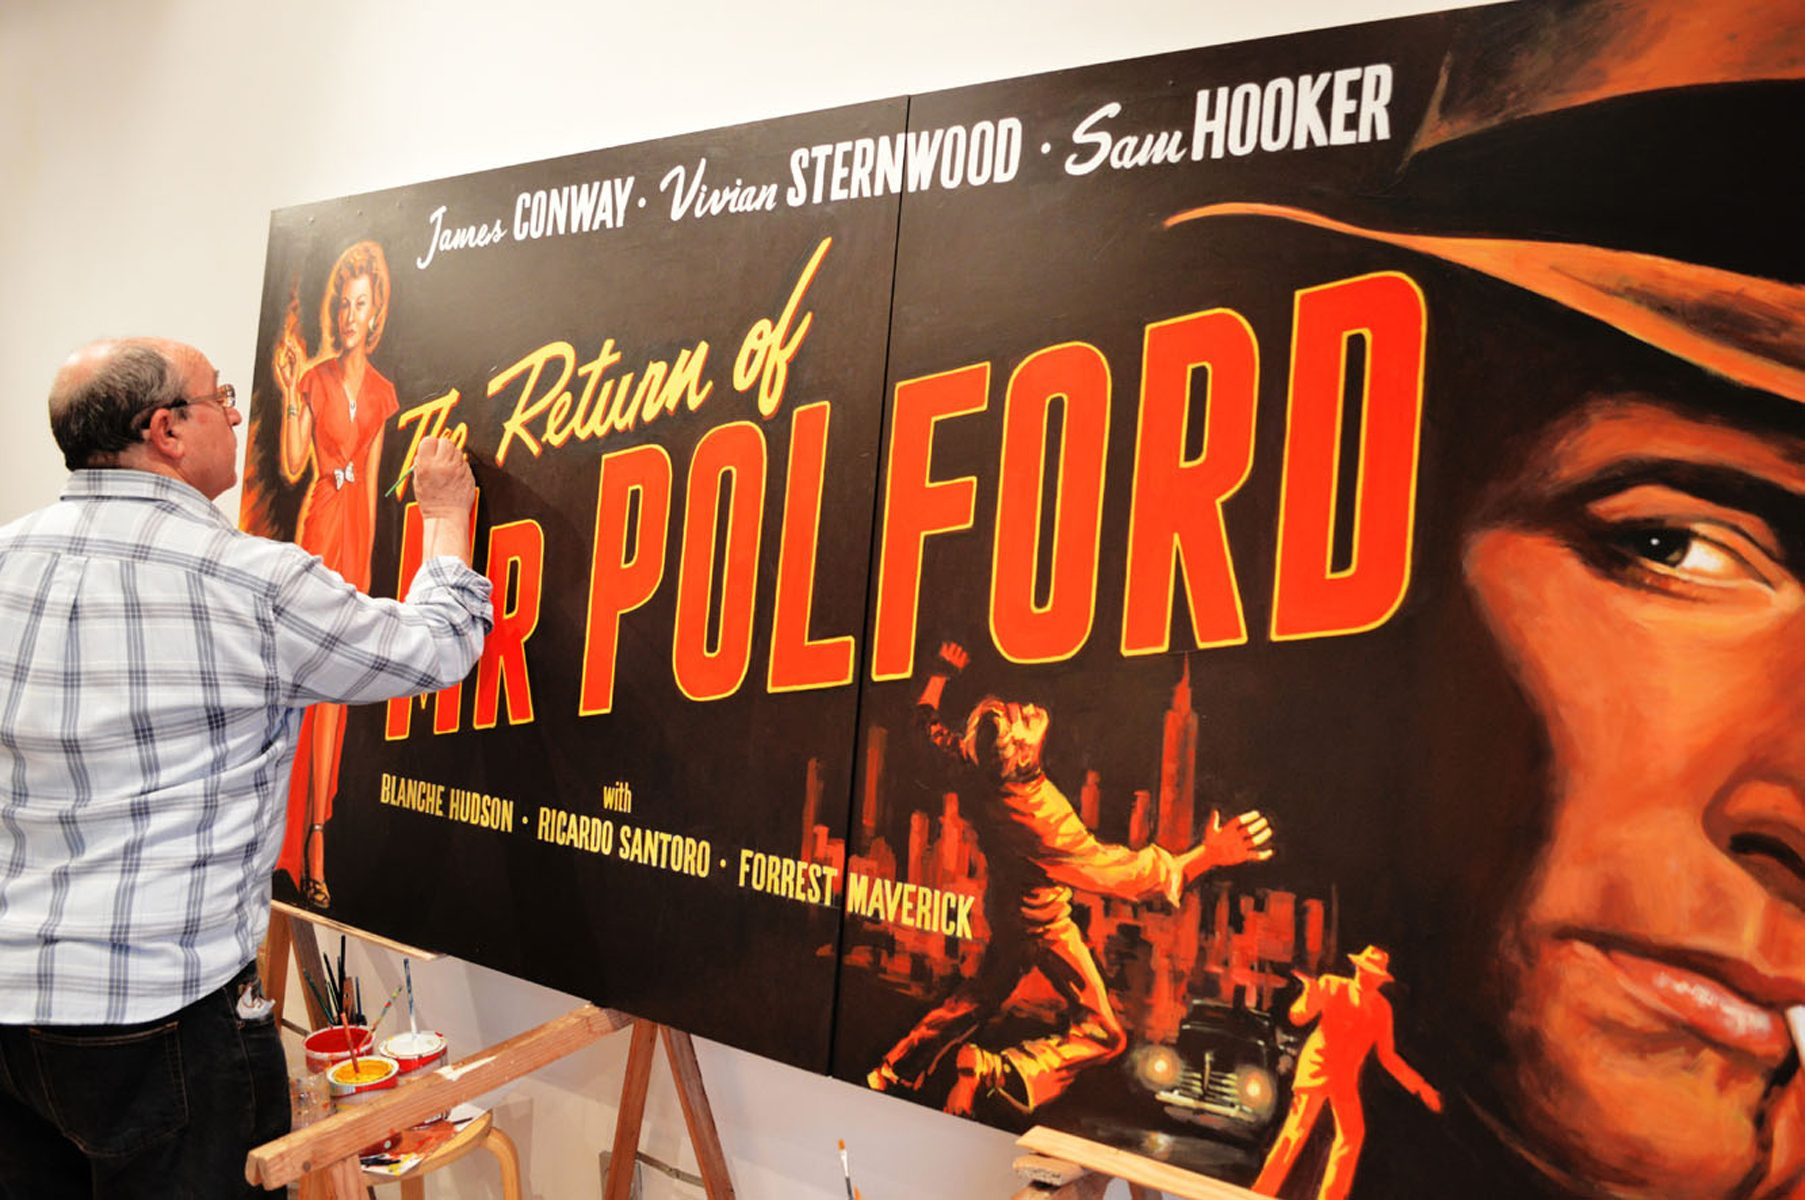 Polford |Jordi Rins